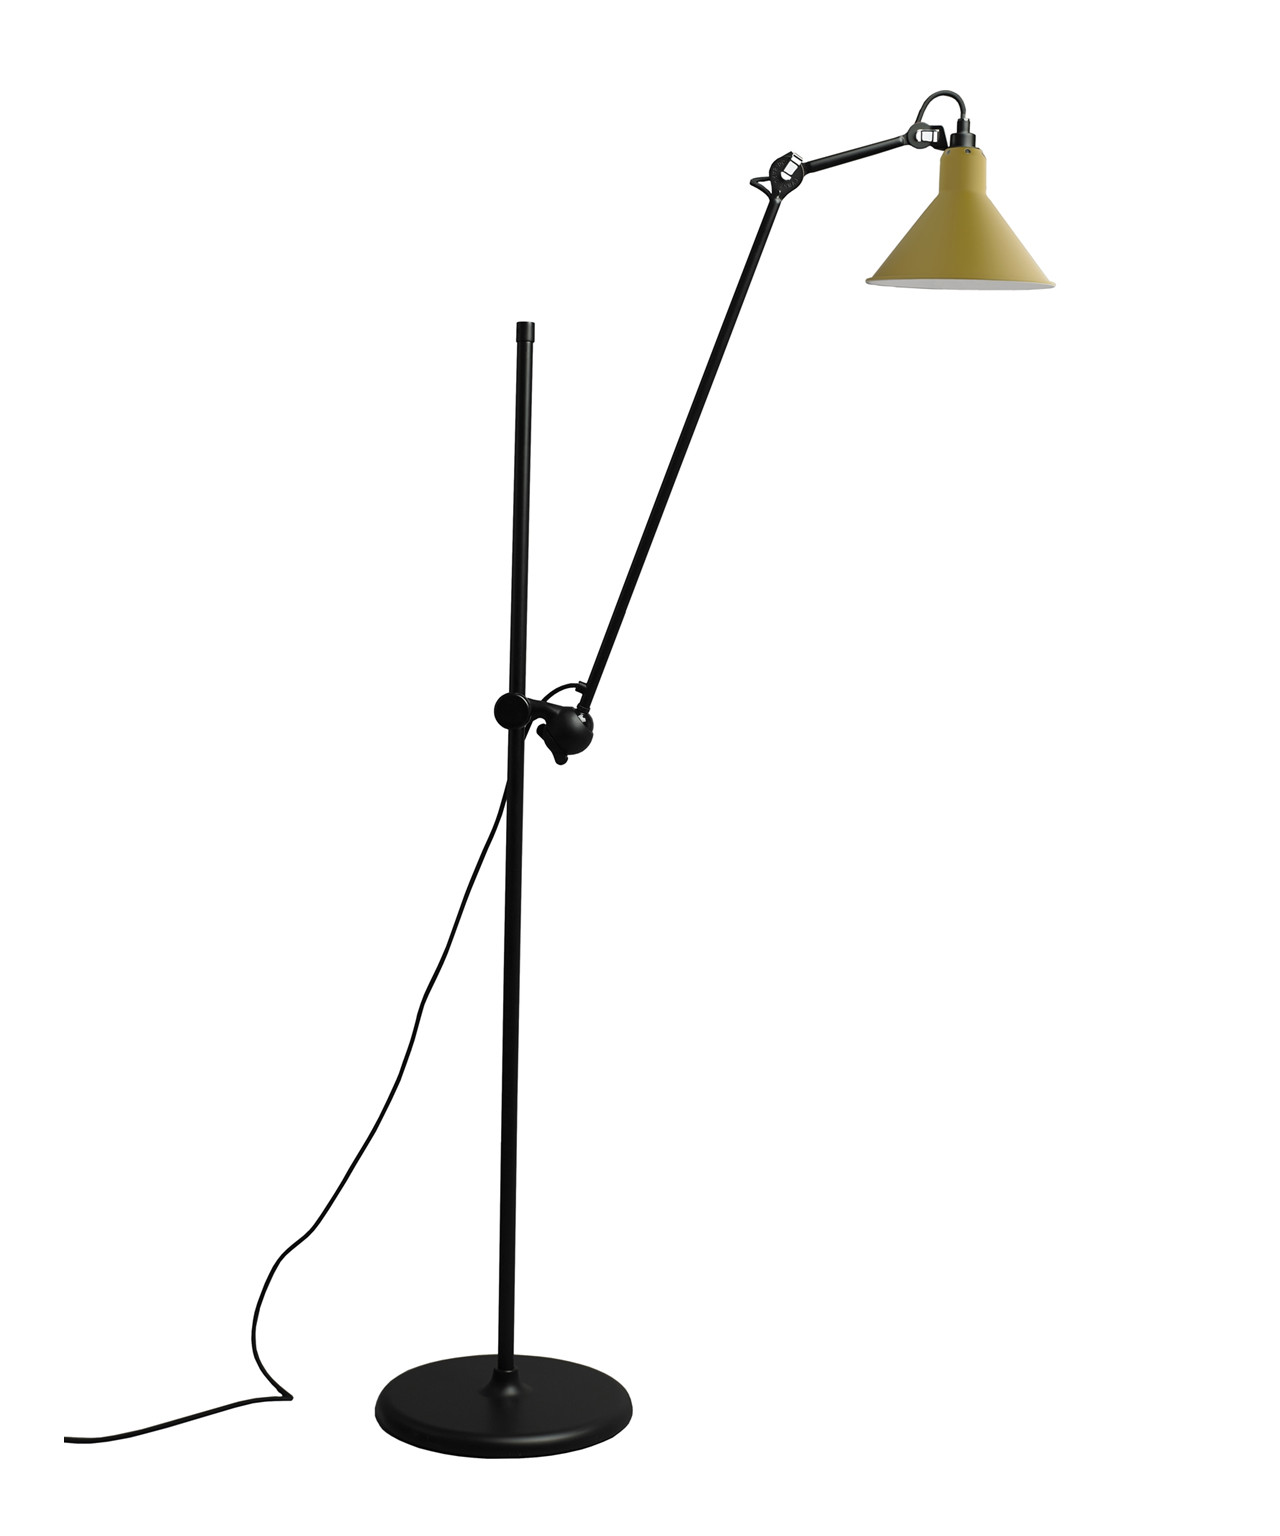 215 gulvlampe gul lampe gras. Black Bedroom Furniture Sets. Home Design Ideas